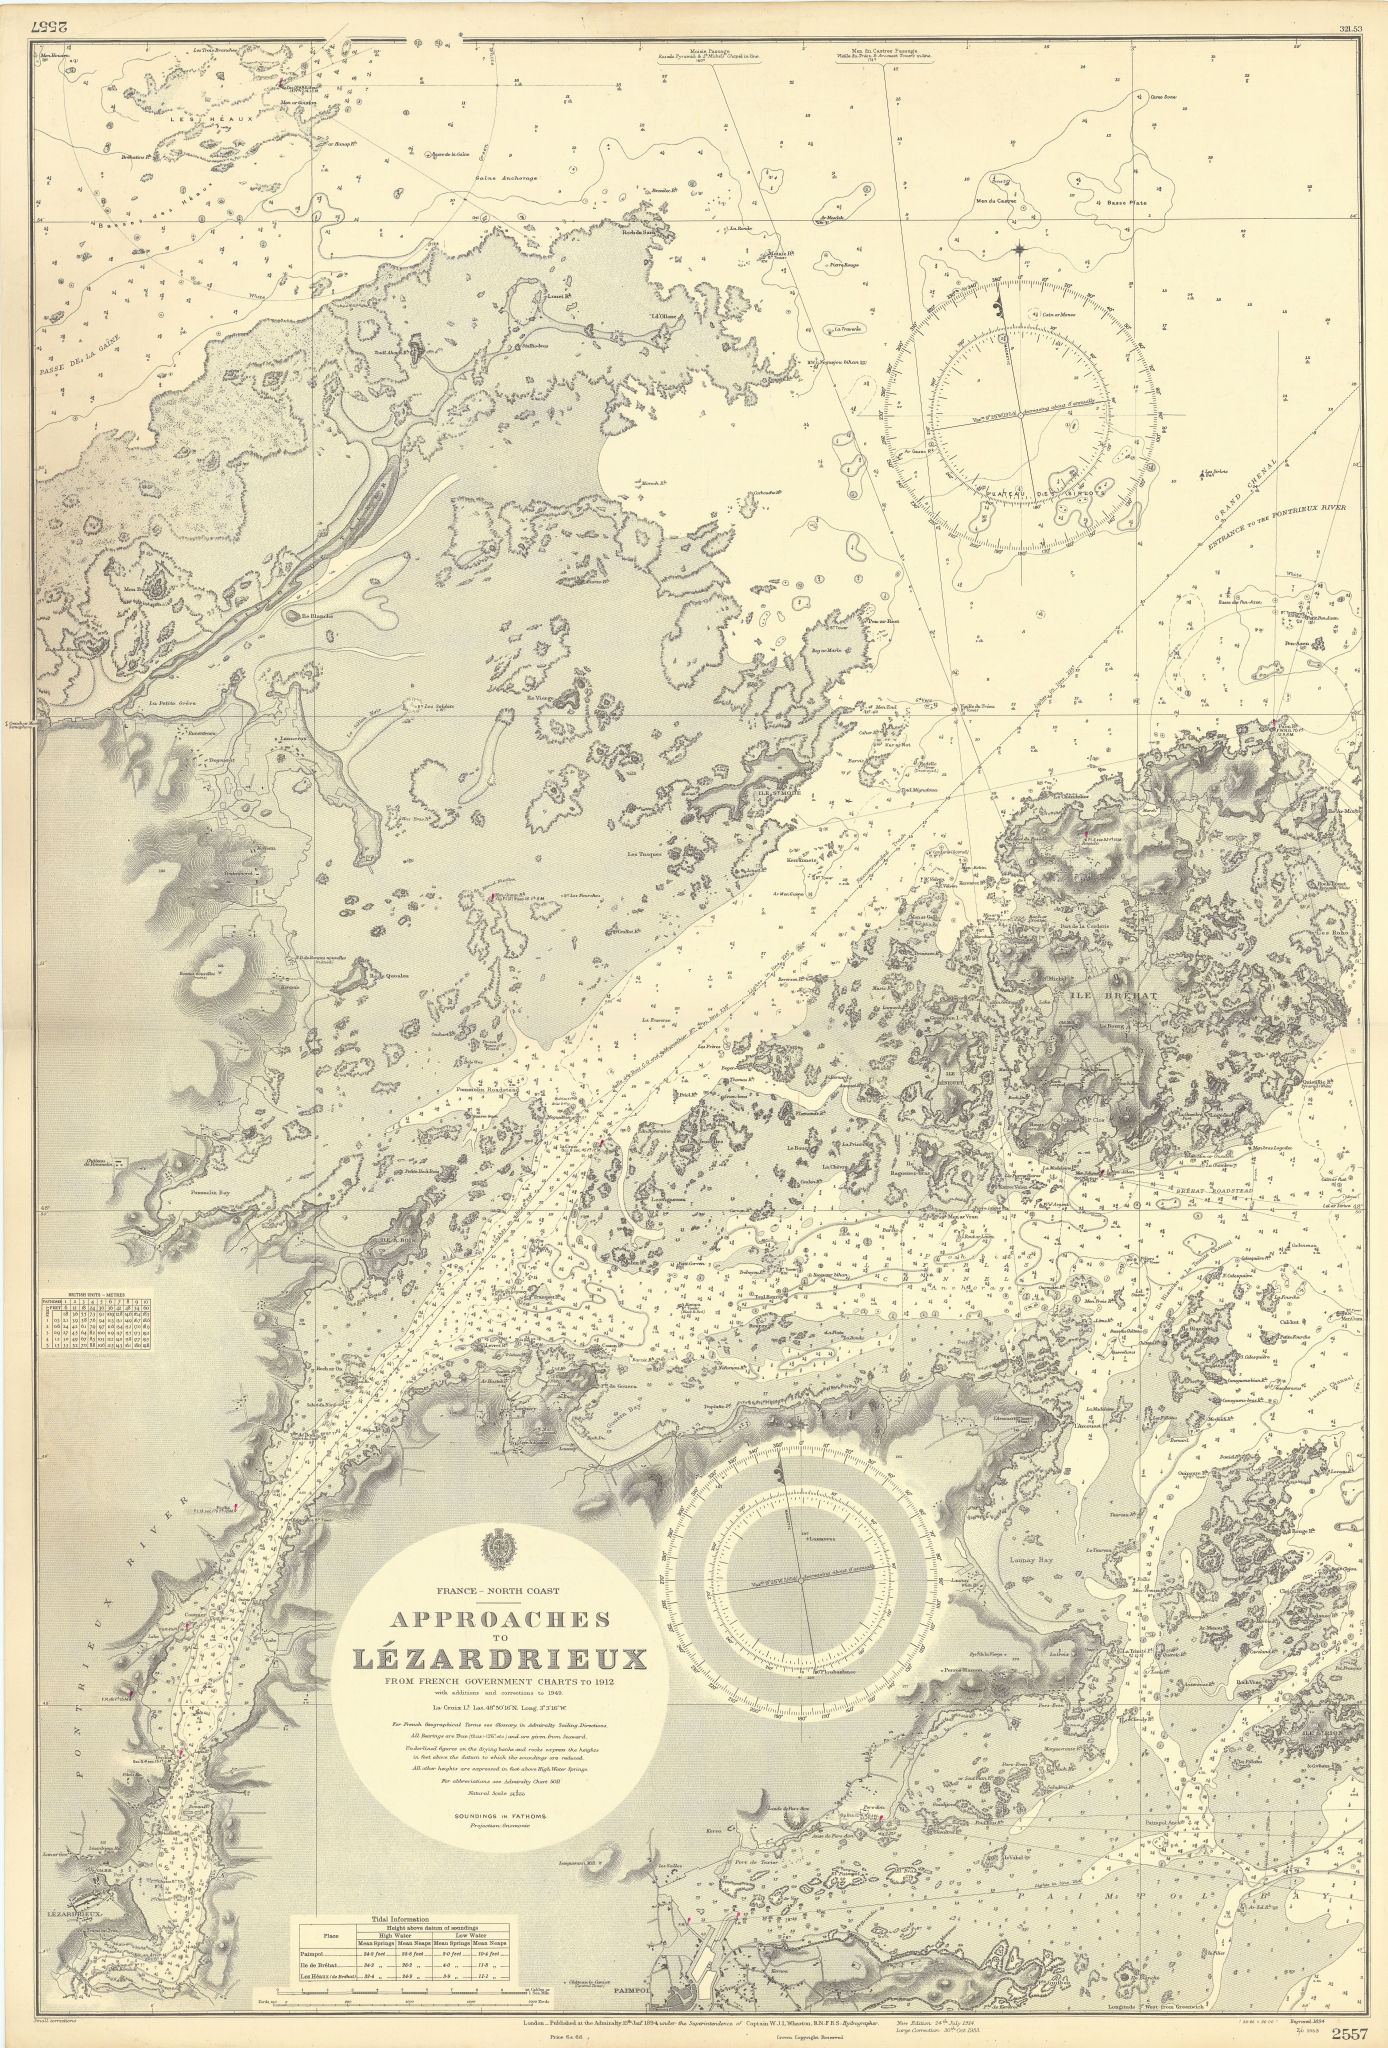 Lézardrieux approach Côtes-d'Armor Brittany ADMIRALTY sea chart 1894 (1953) map